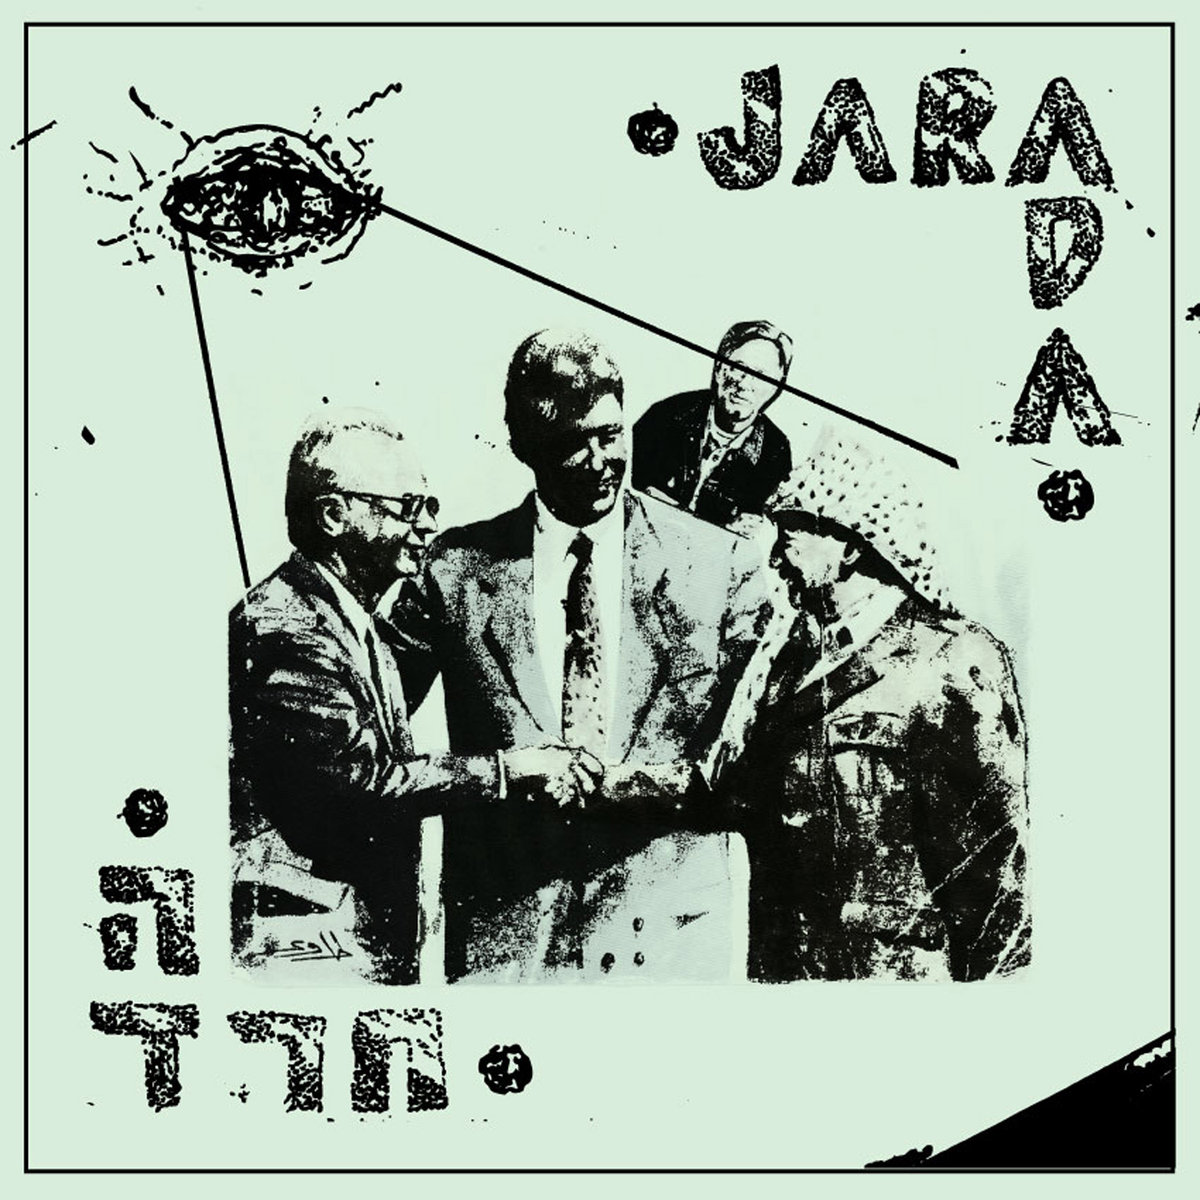 JARADA חרדה תקליט